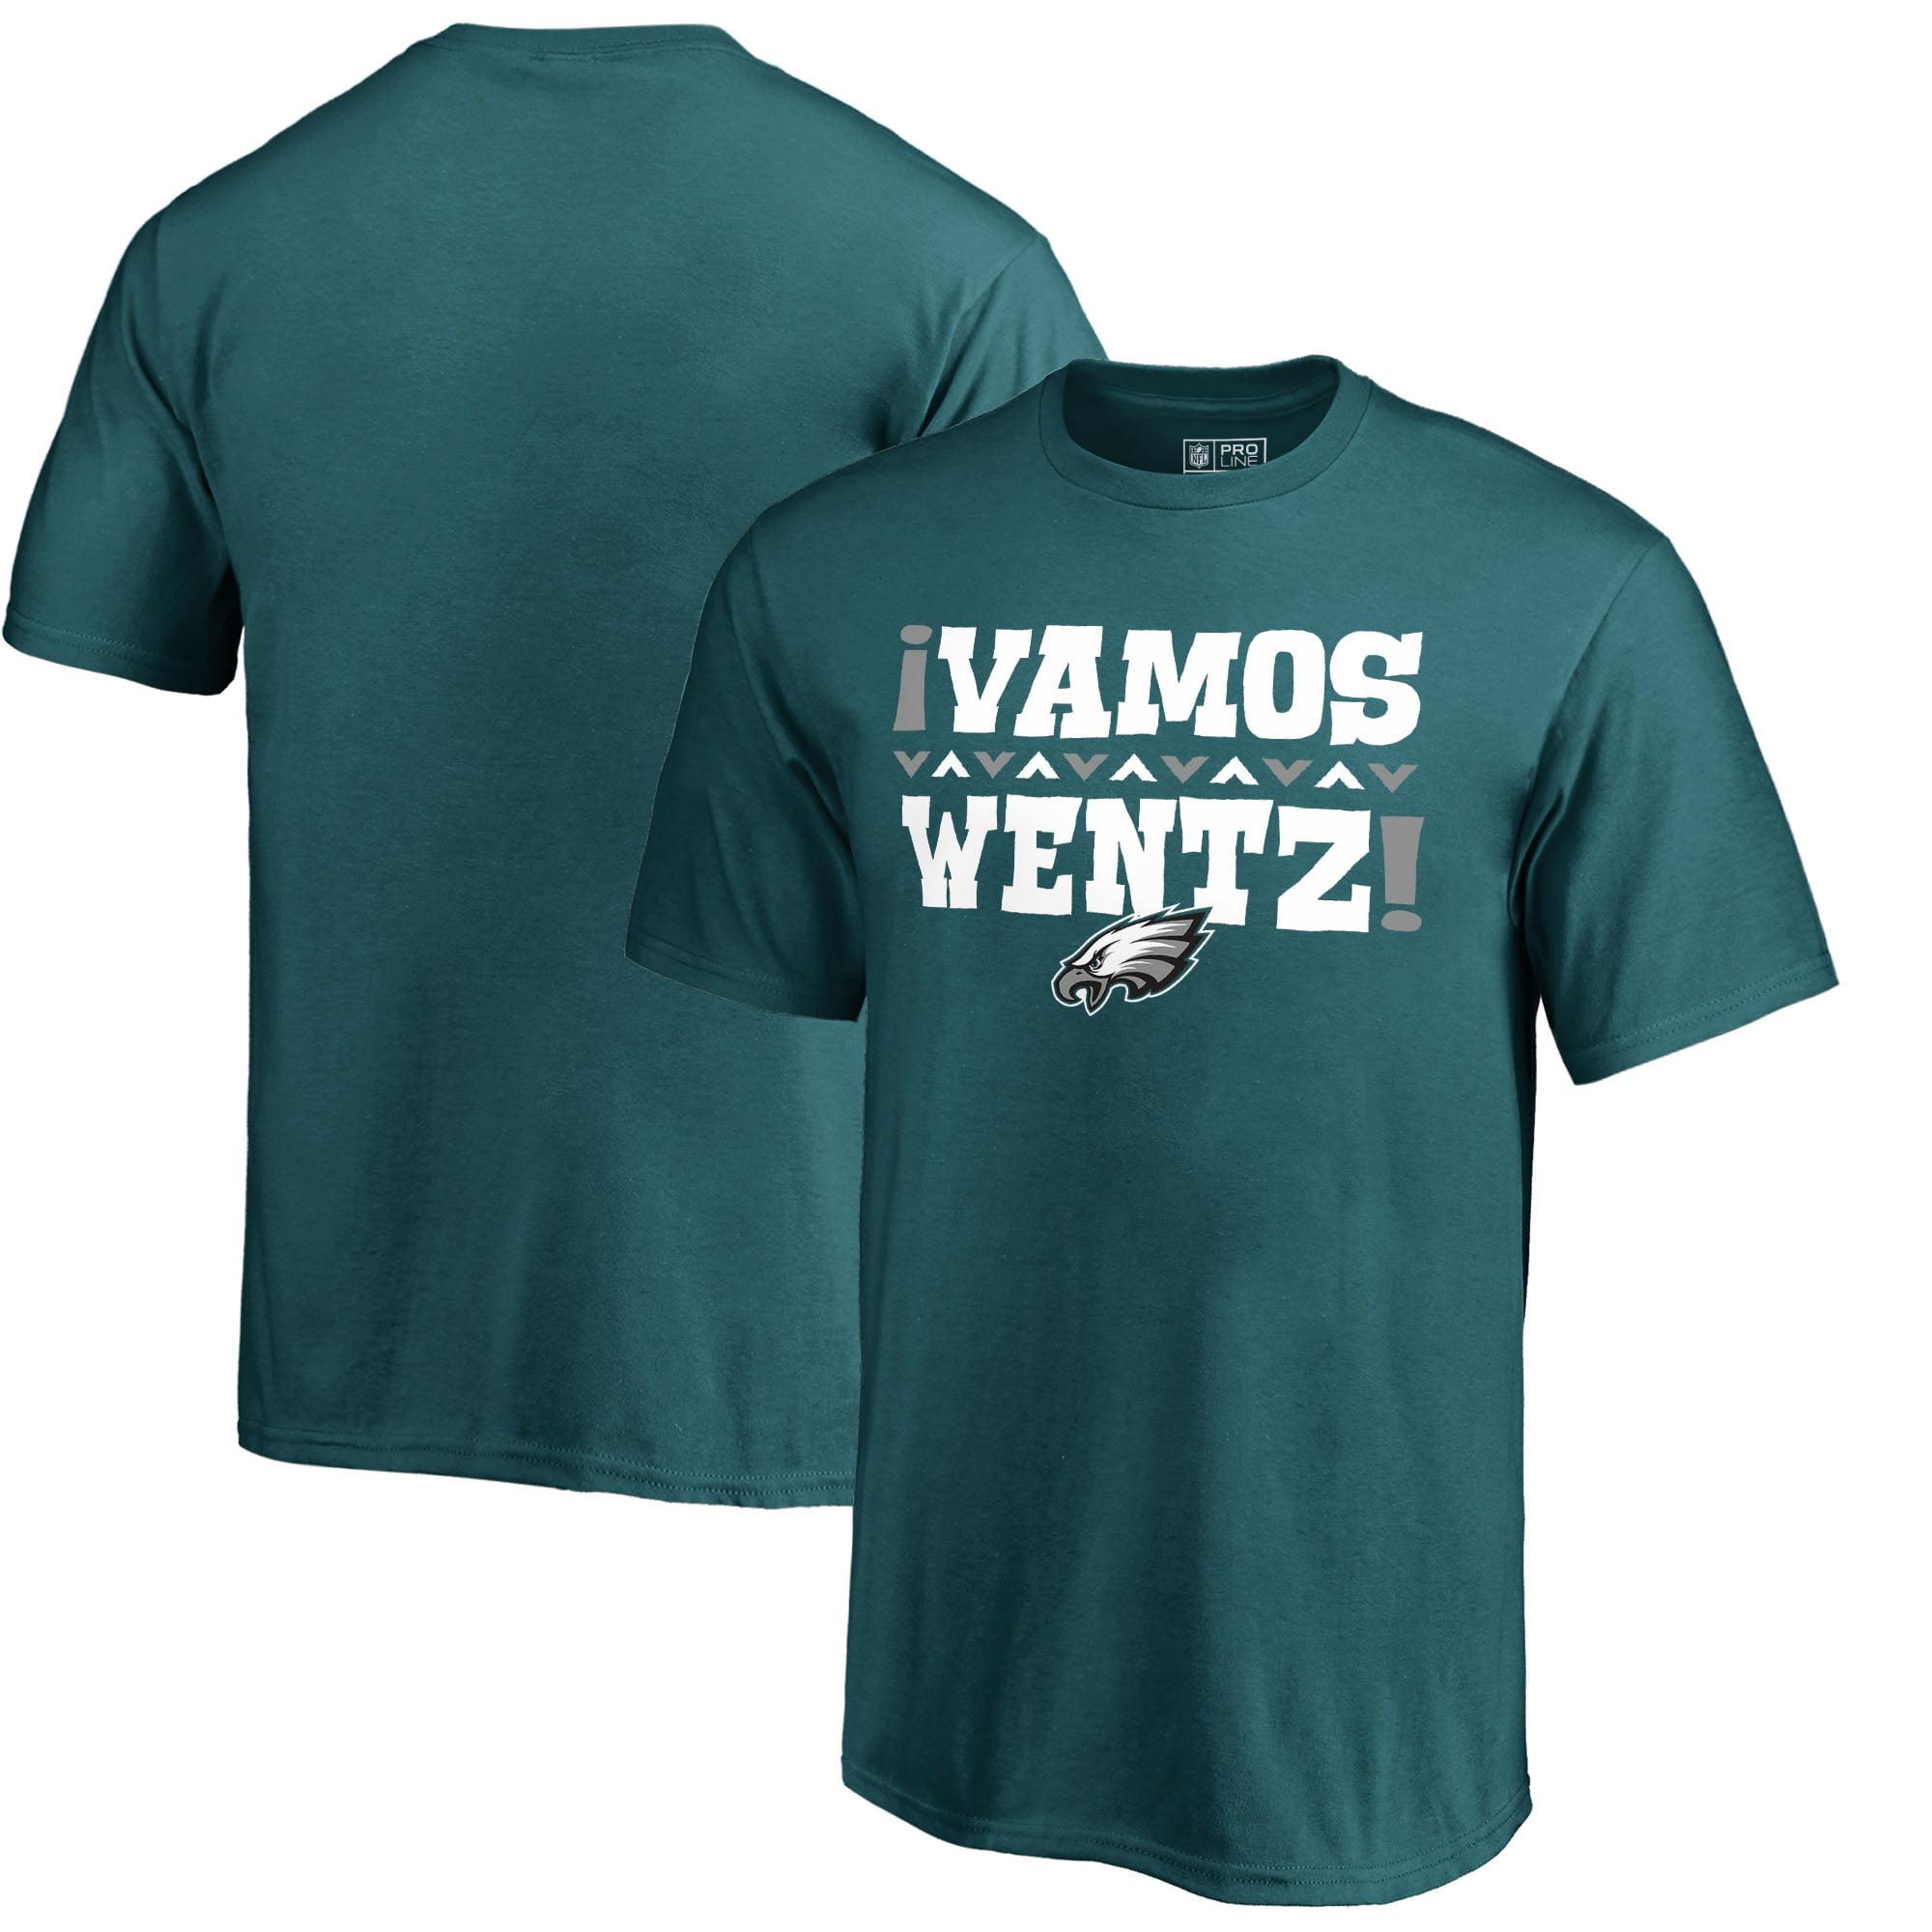 Carson Wentz Philadelphia Eagles NFL Pro Line by Fanatics Branded Youth Vamos T-Shirt - Midnight Green